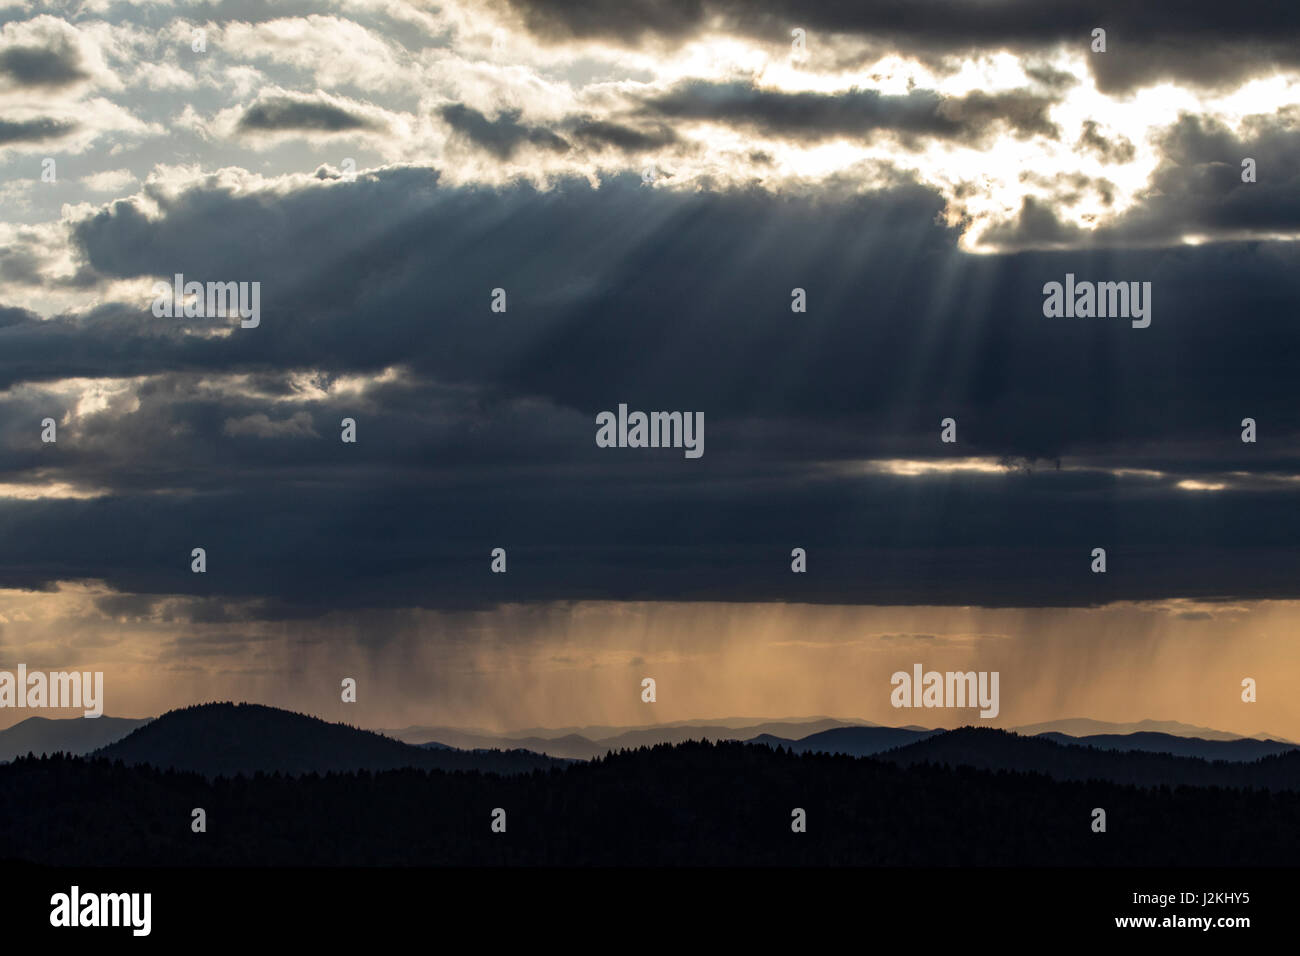 Sunset from Art Loeb Trail near Black Balsam Knob - Blue Ridge Parkway, North Carolina, USA - Stock Image